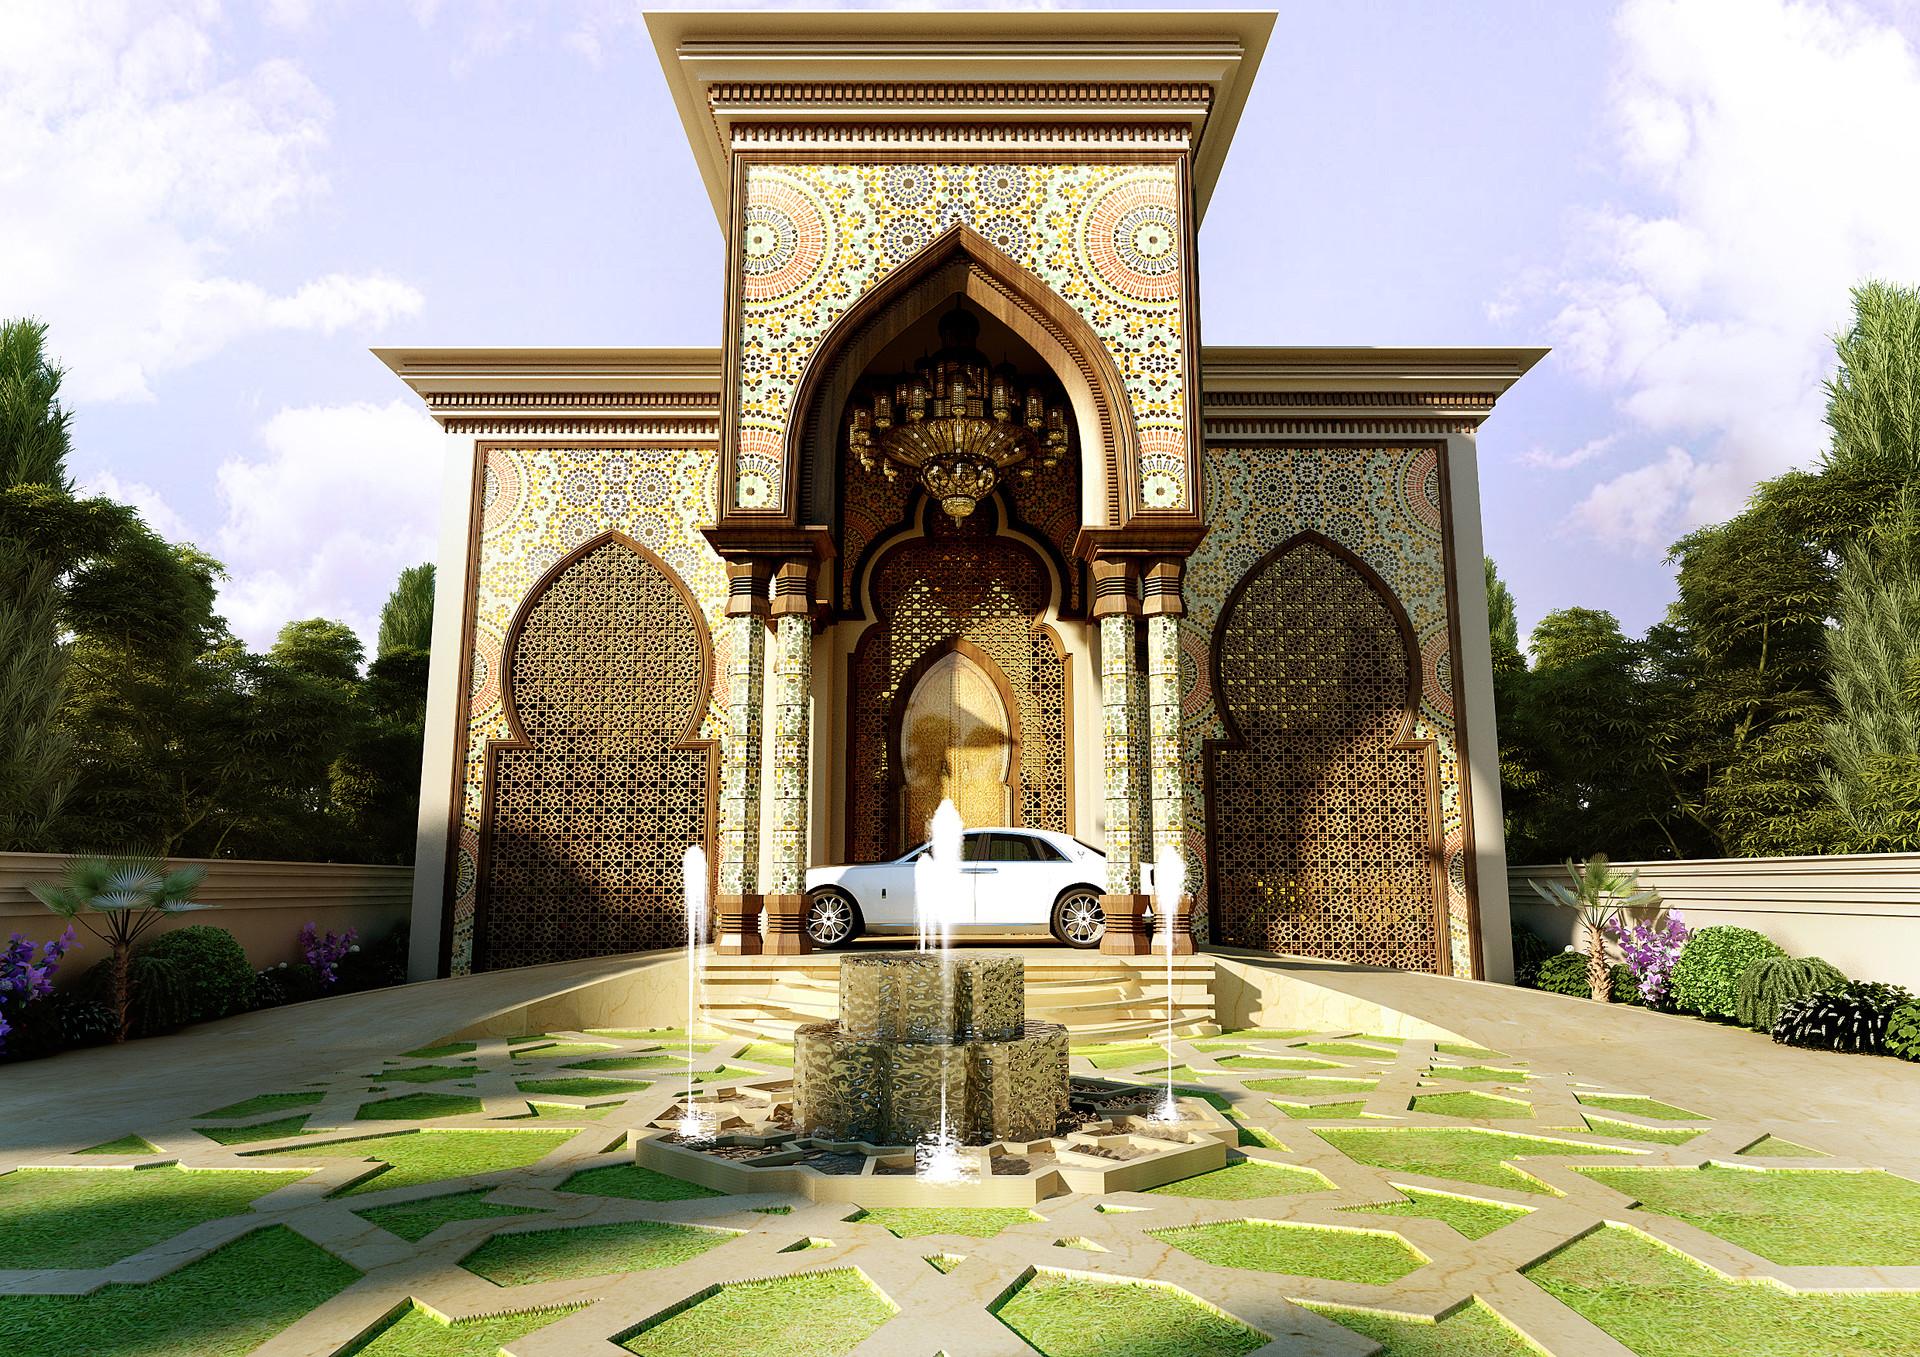 Spanish Villa Style Homes Usmaan Mukhtar Moroccan Villa Saudi Arabia